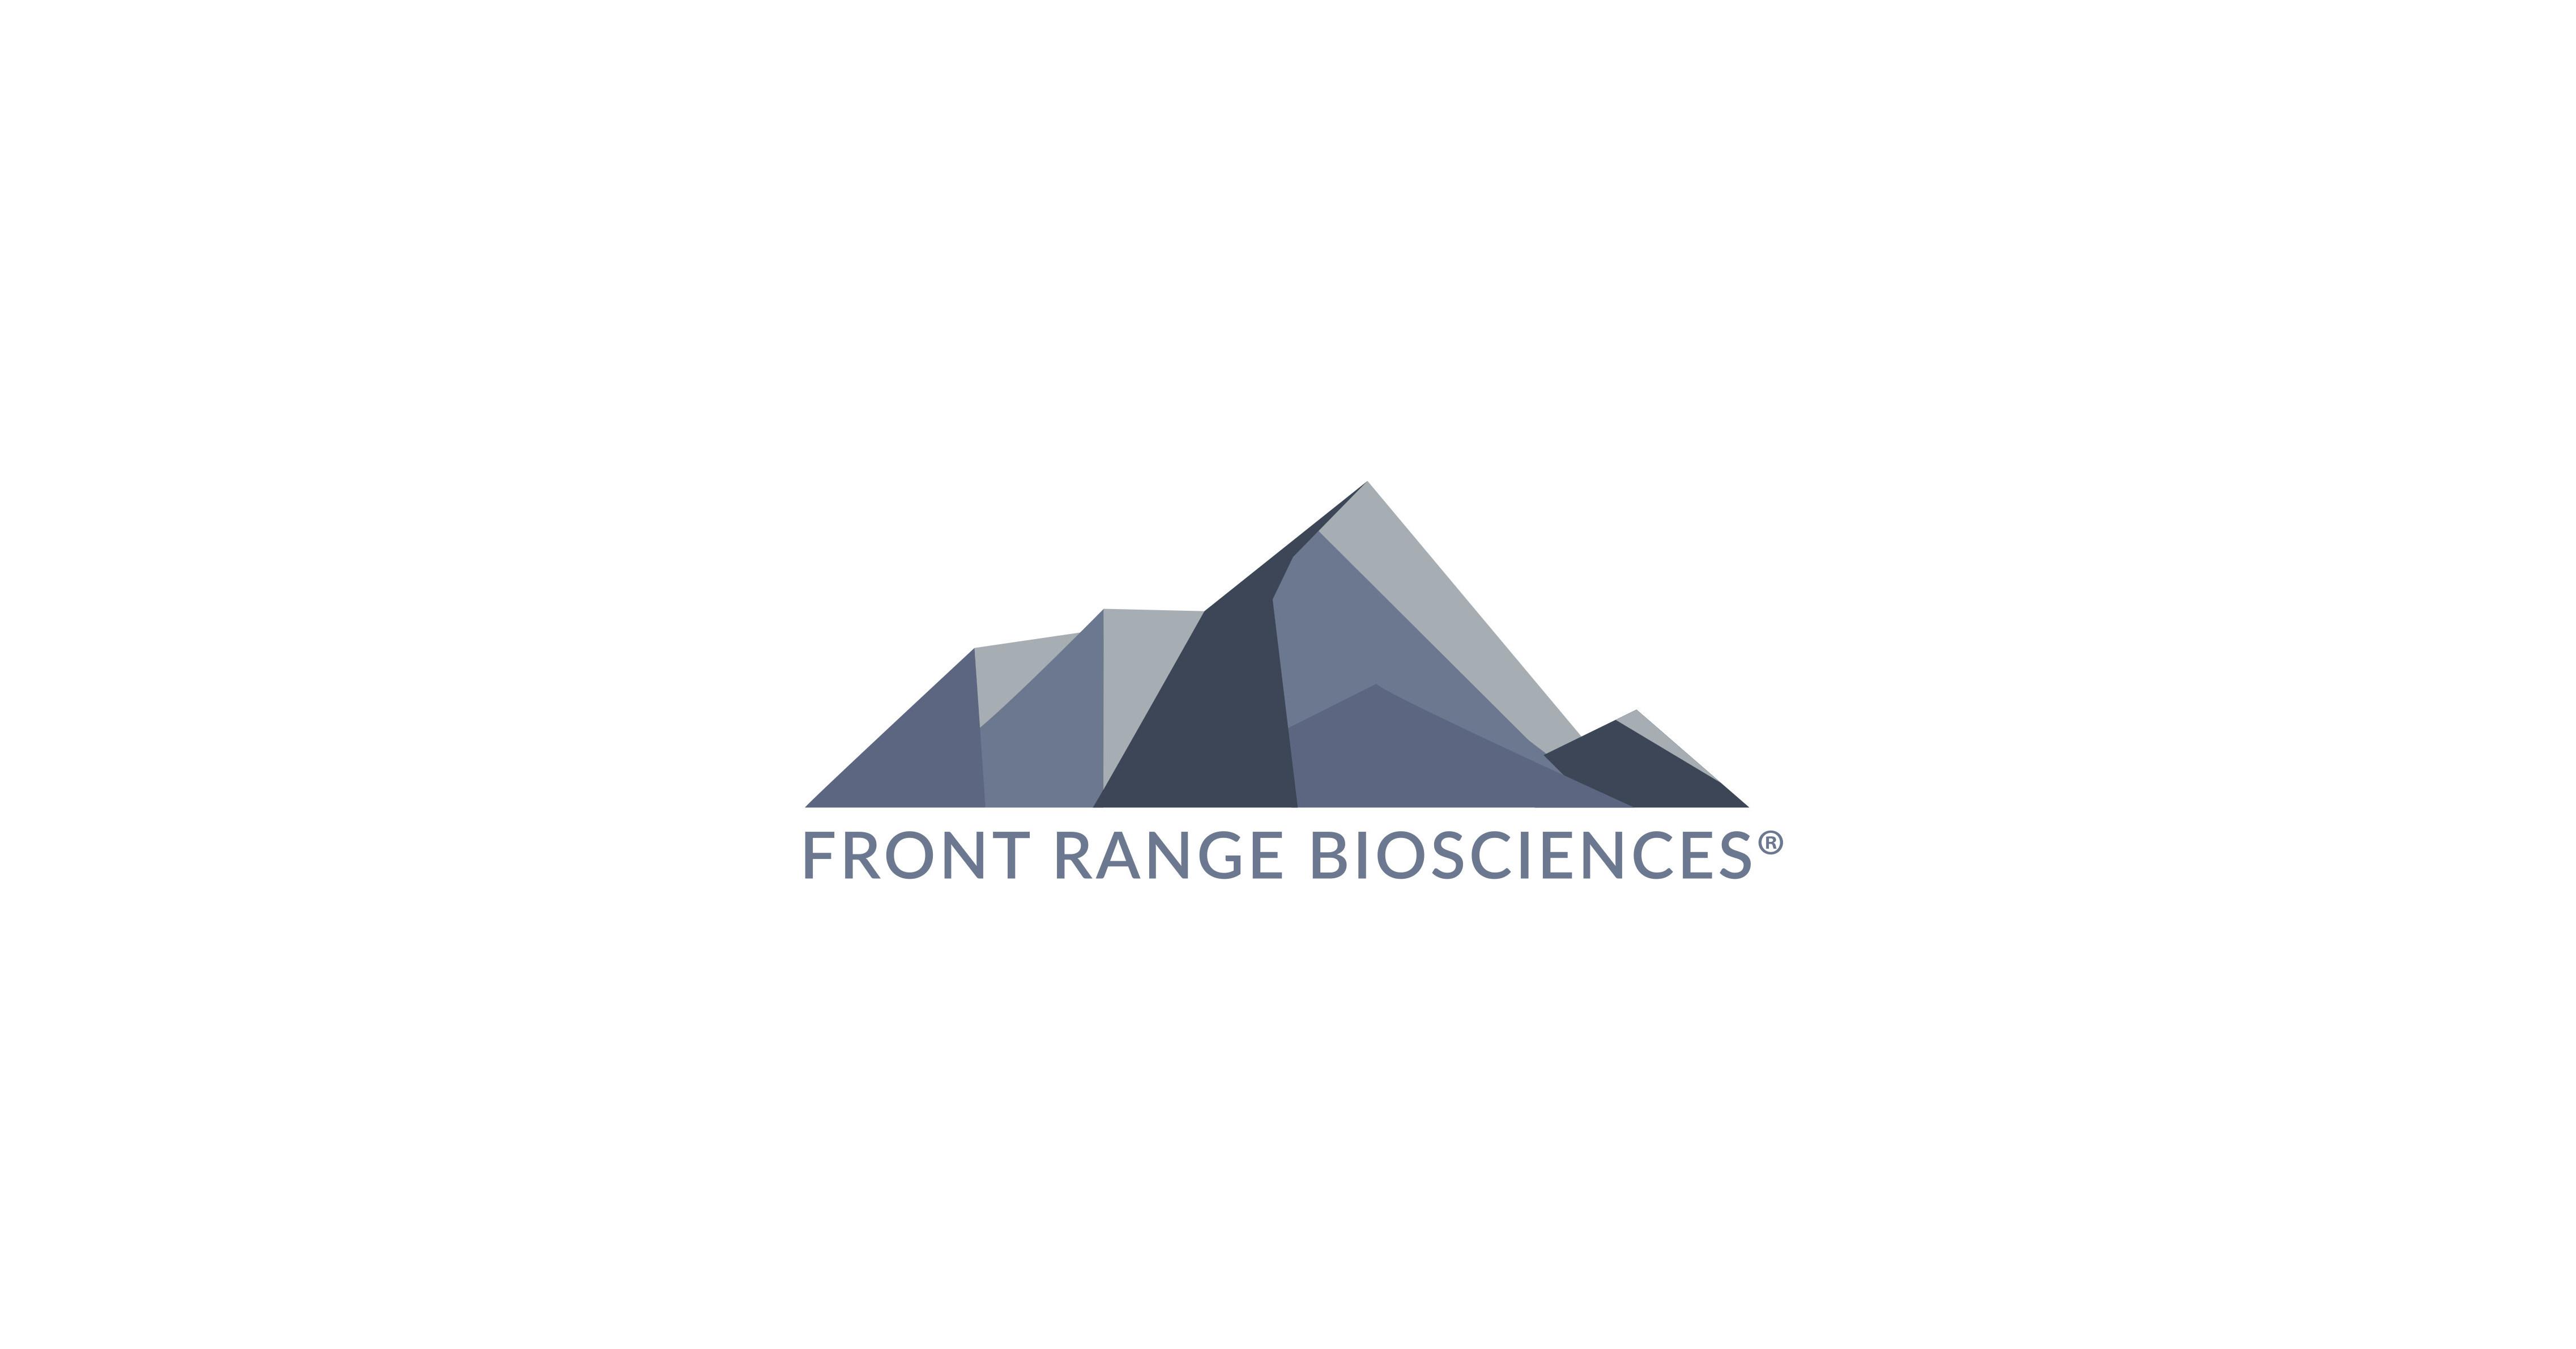 Front Range Biosciences logo